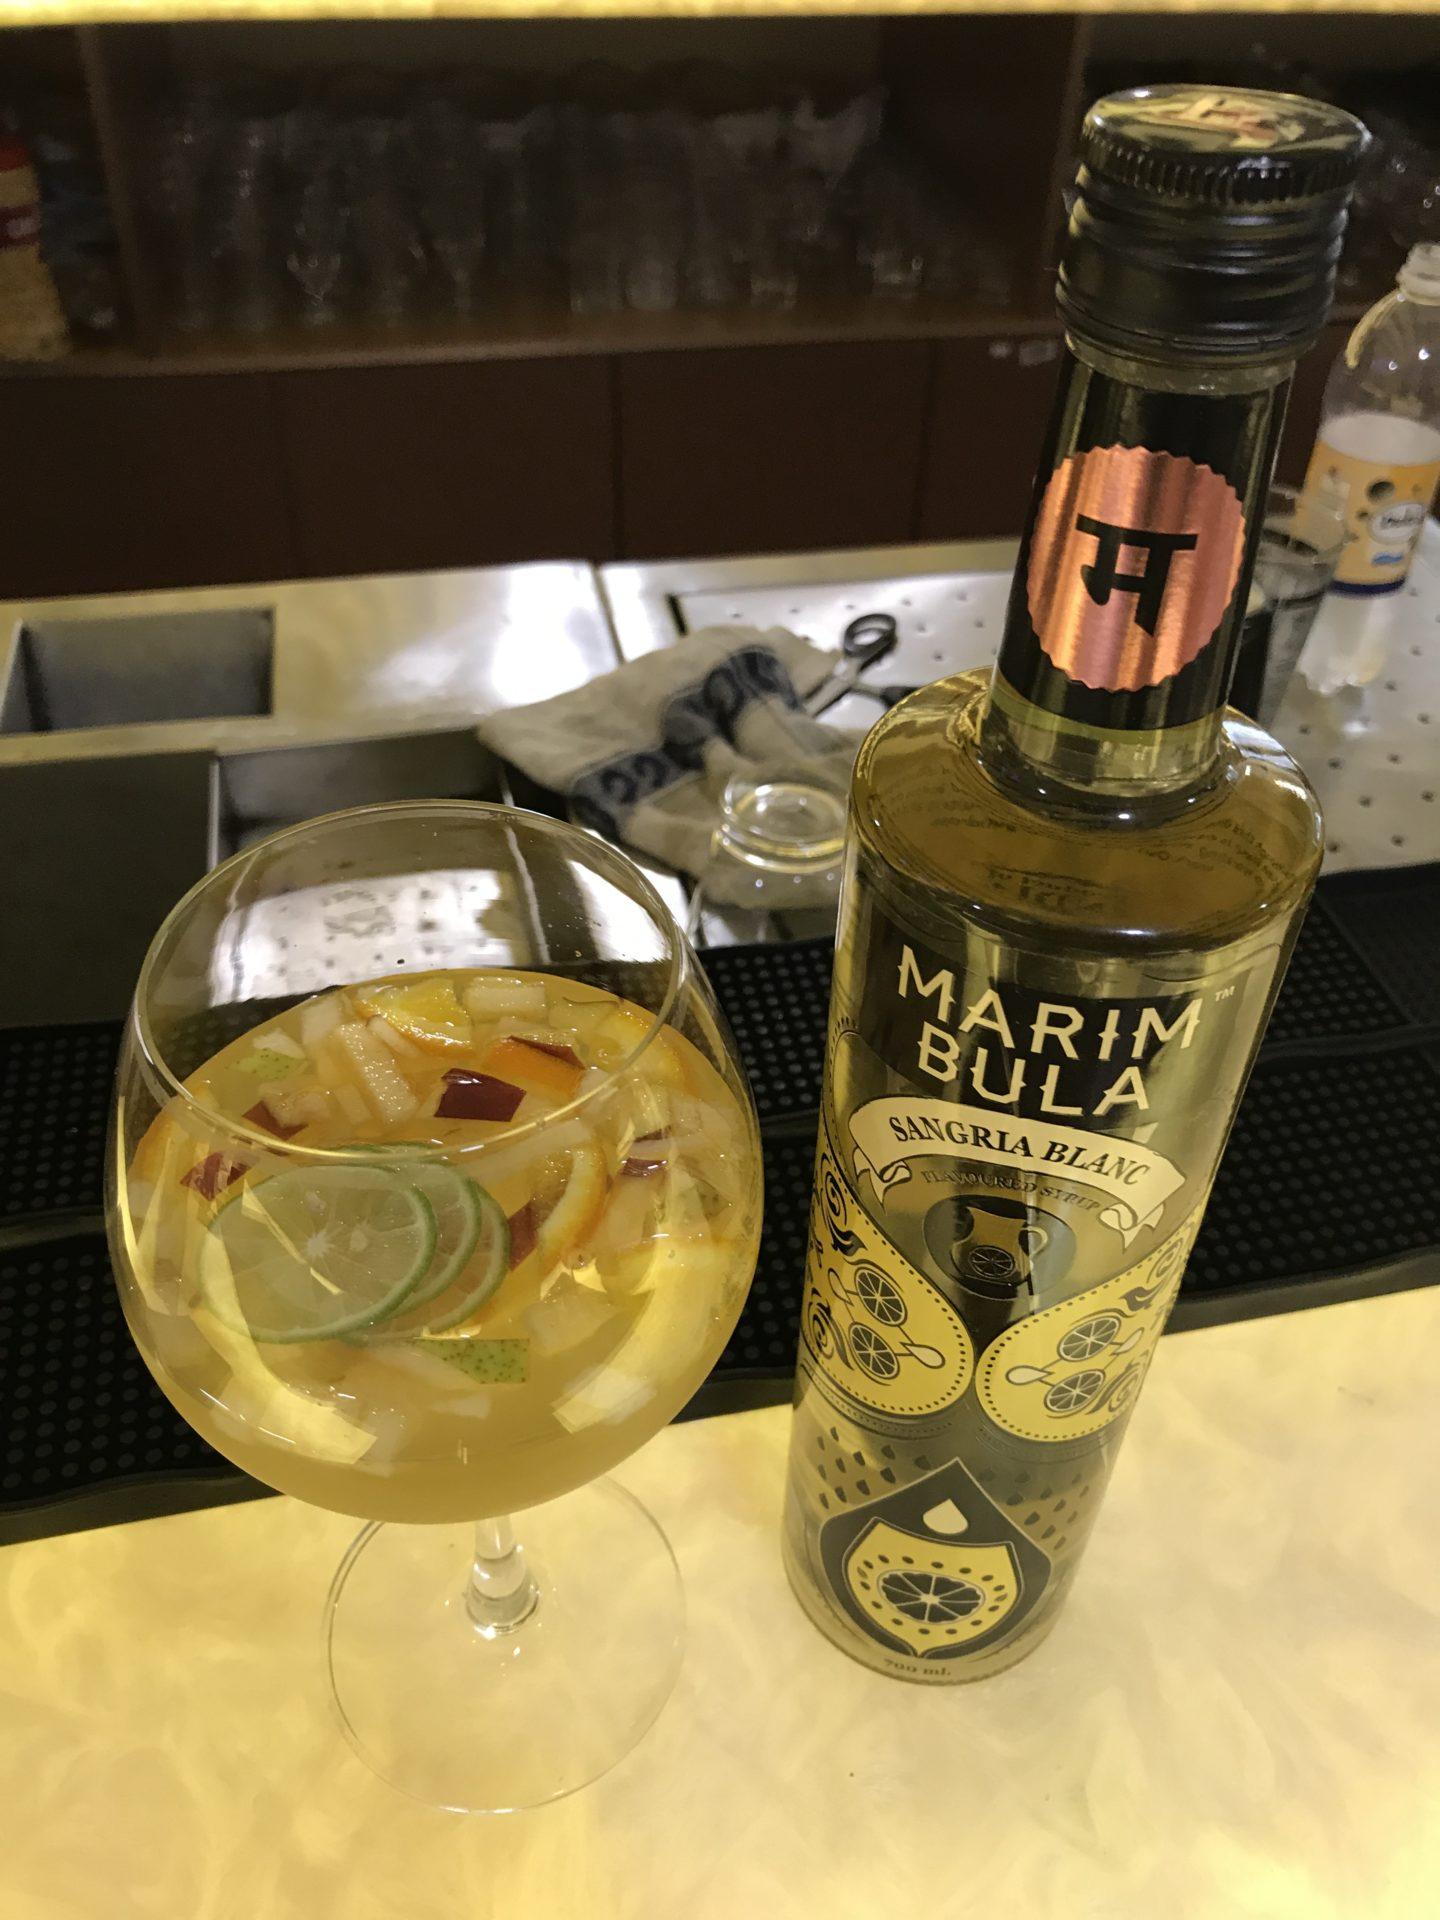 marim bula white wine sangria